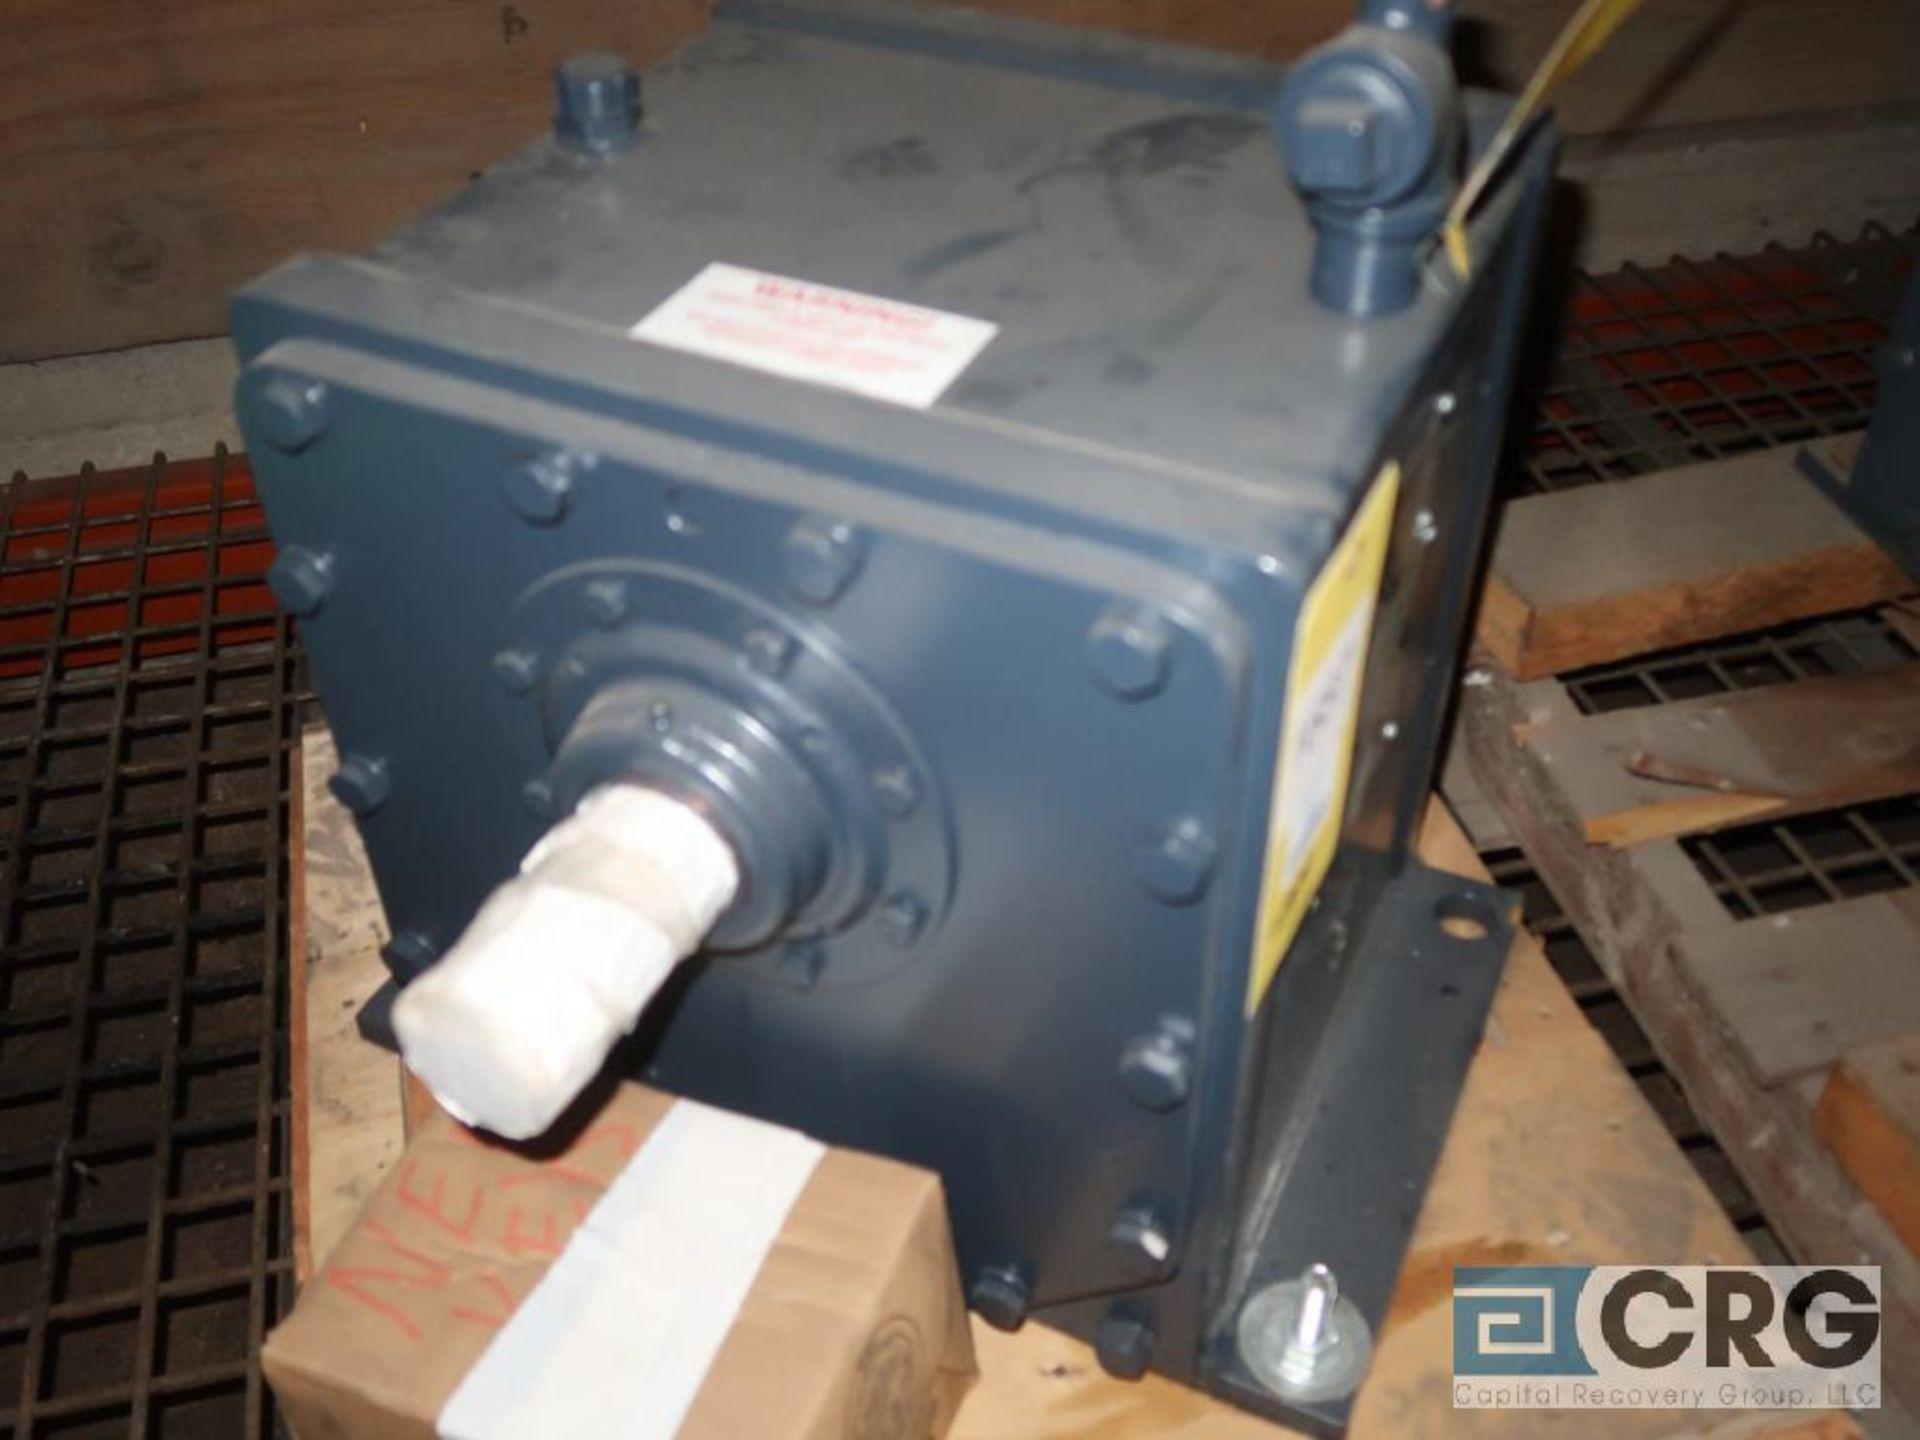 Falk 1062 FC2 gear drive, ratio-3.475, input RPM 1,750, output RPM 504.3, service rate HP. 76.9, s/n